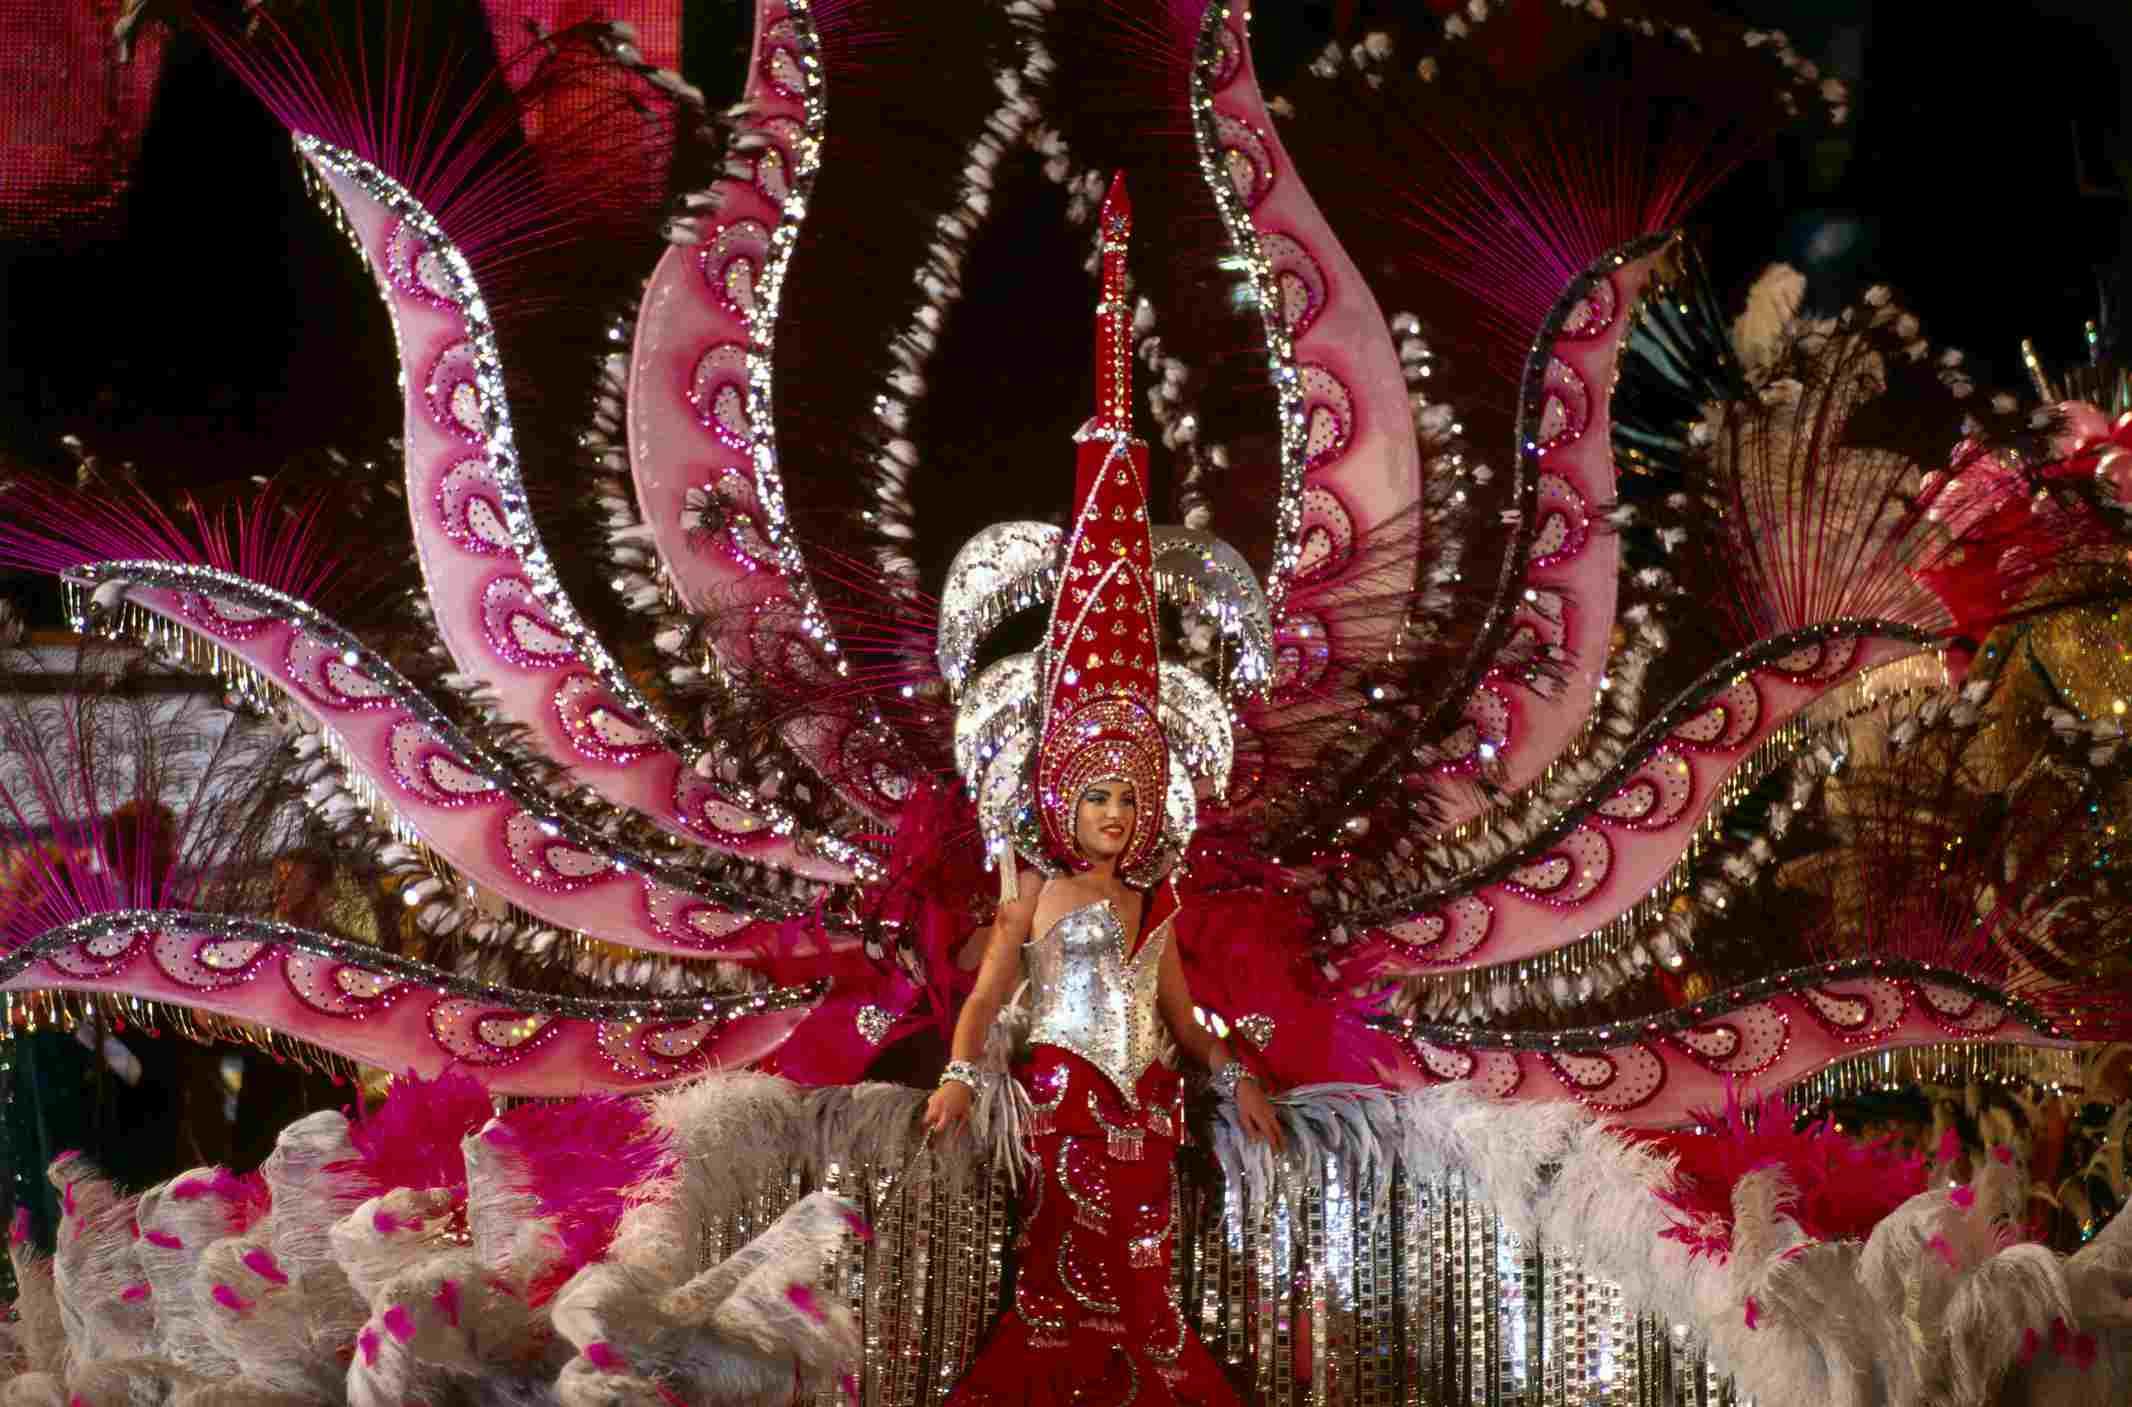 Election of the Carnival Queen, Santa Cruz de Tenerife, Tenerife, Canary Islands, Spain, Europe